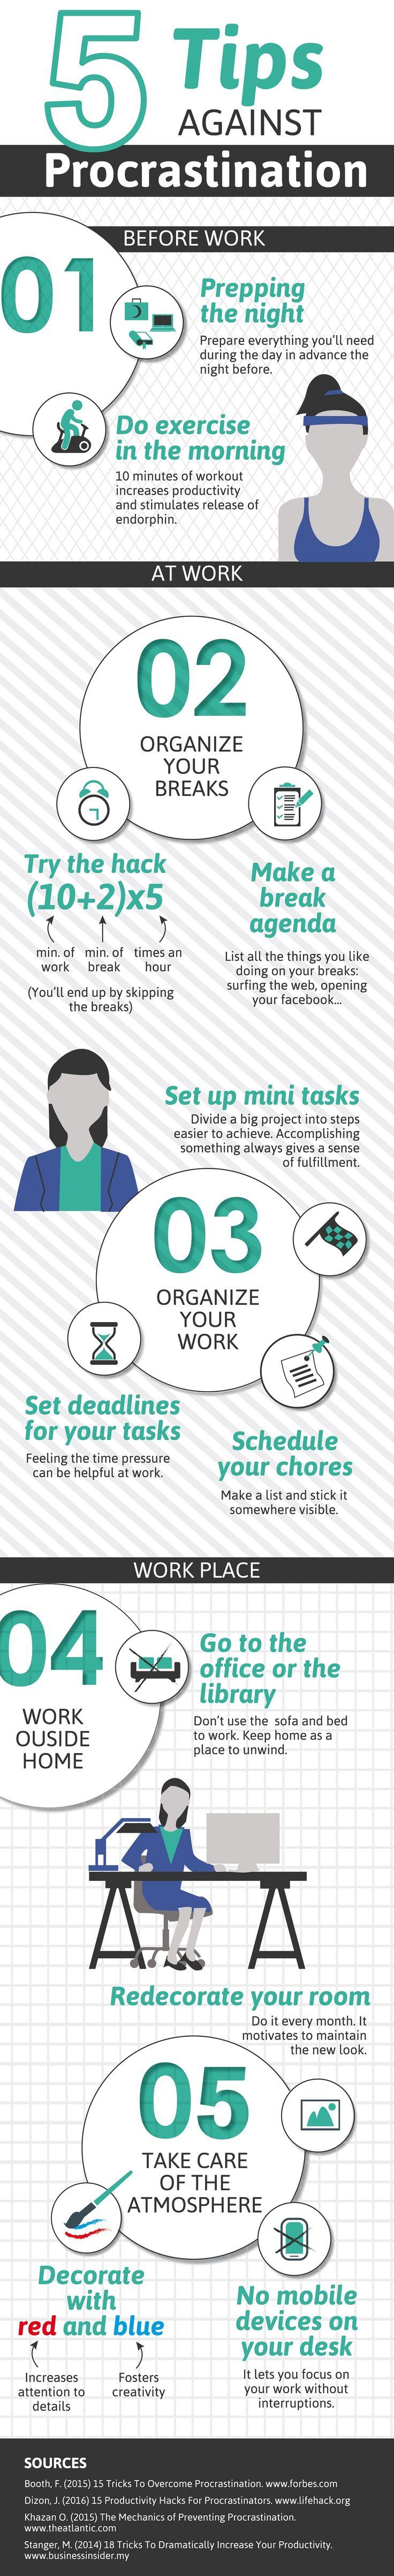 5 Tips against Procrastination #Infographic #TimeMangement